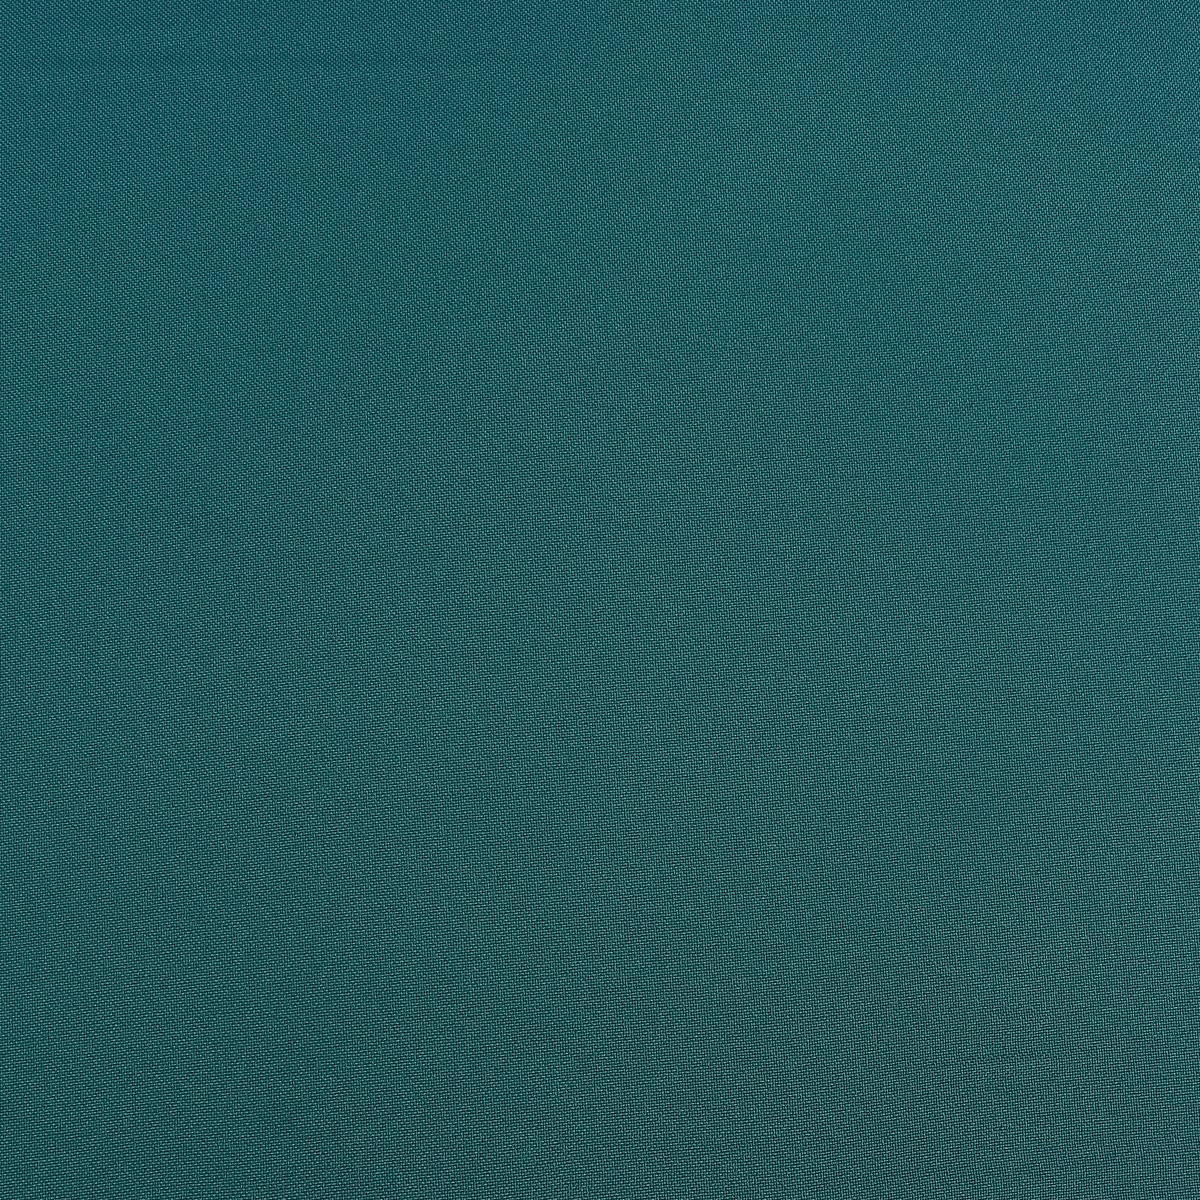 Kreativstoff Universalstoff Polyester Stretch petrol 1,48m Breite